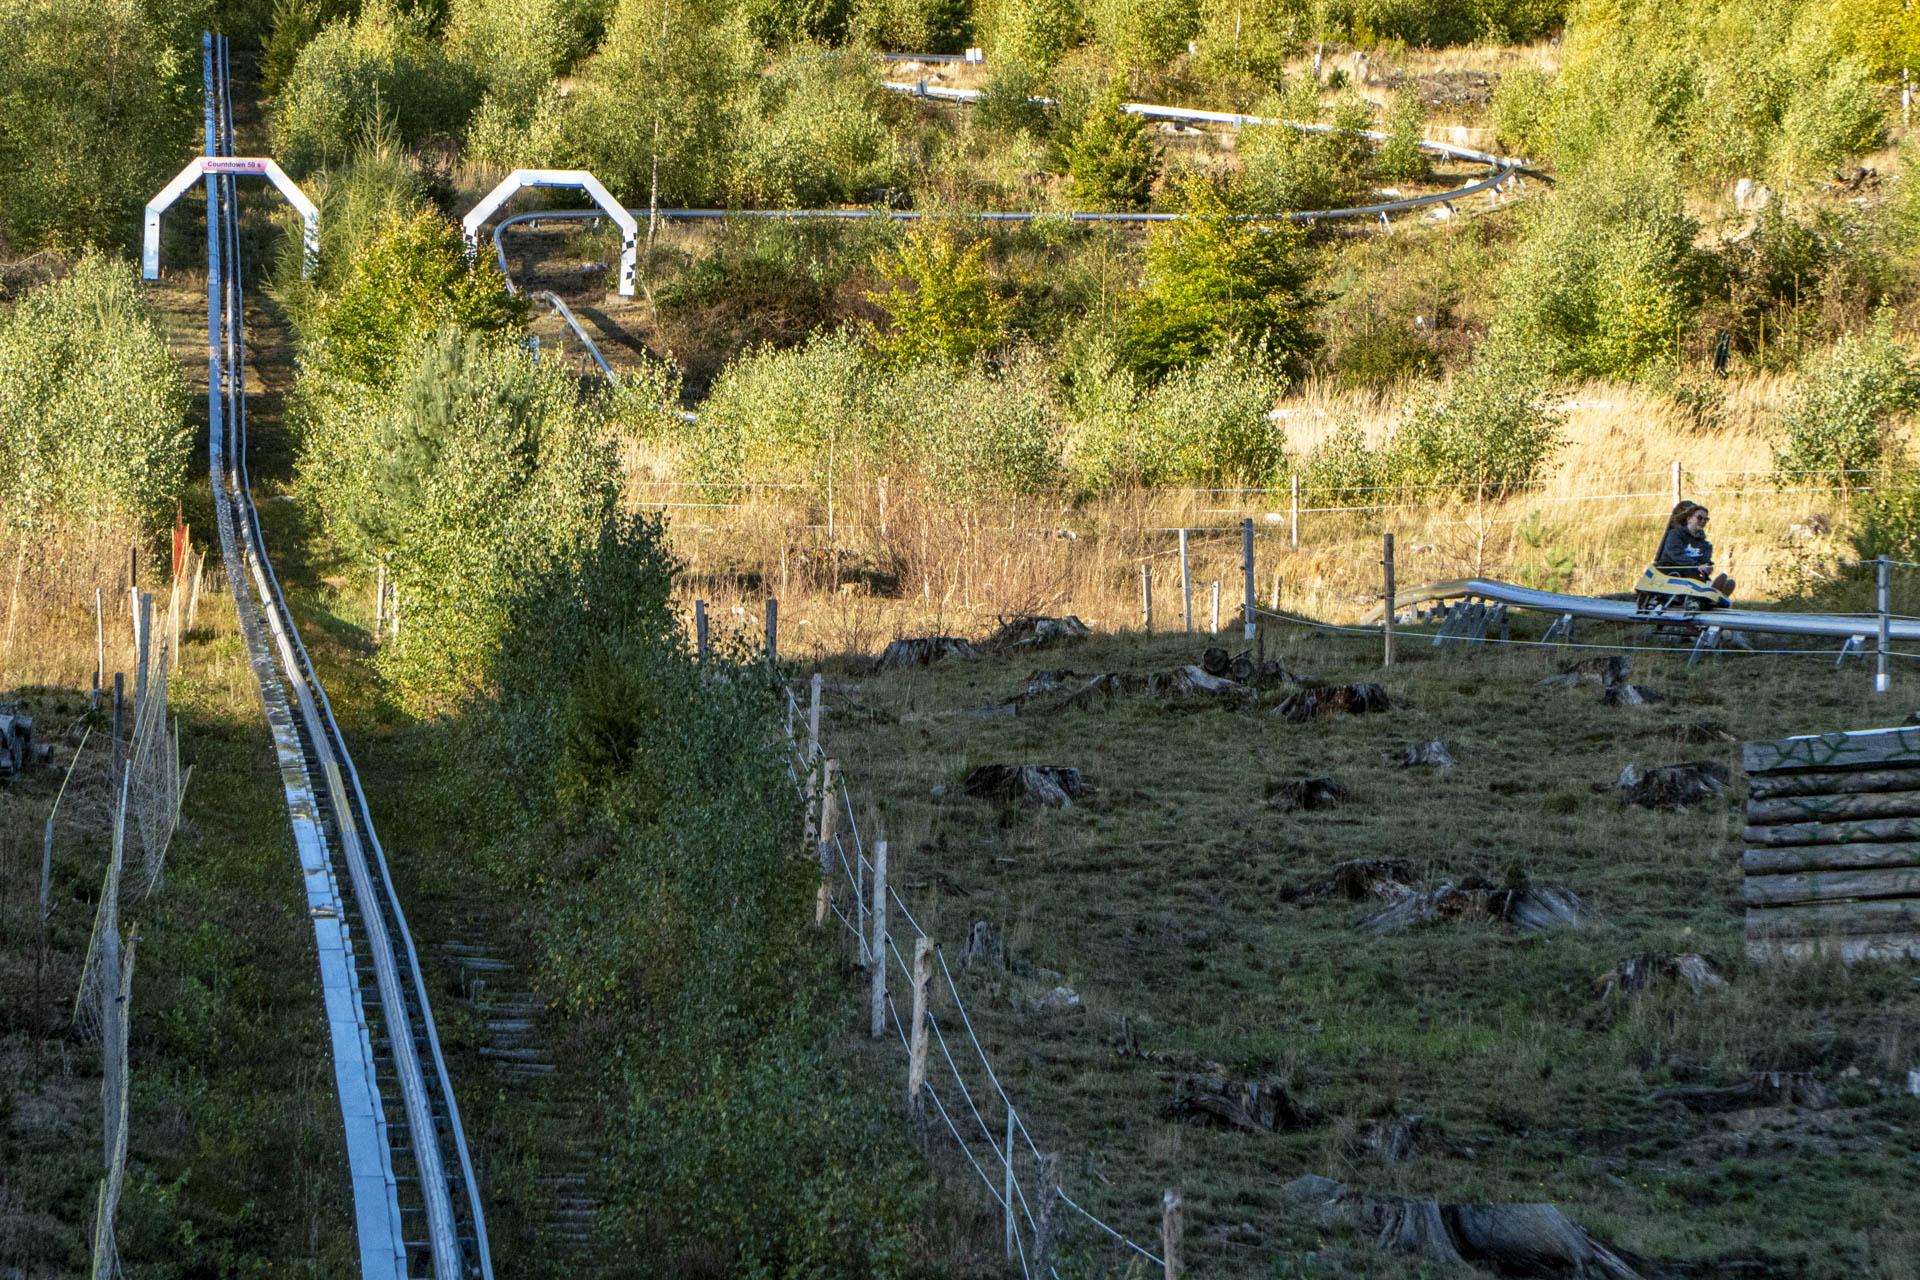 Erlebnis-Rodelbahn Ruhla • Brandauer Mountain Coaster